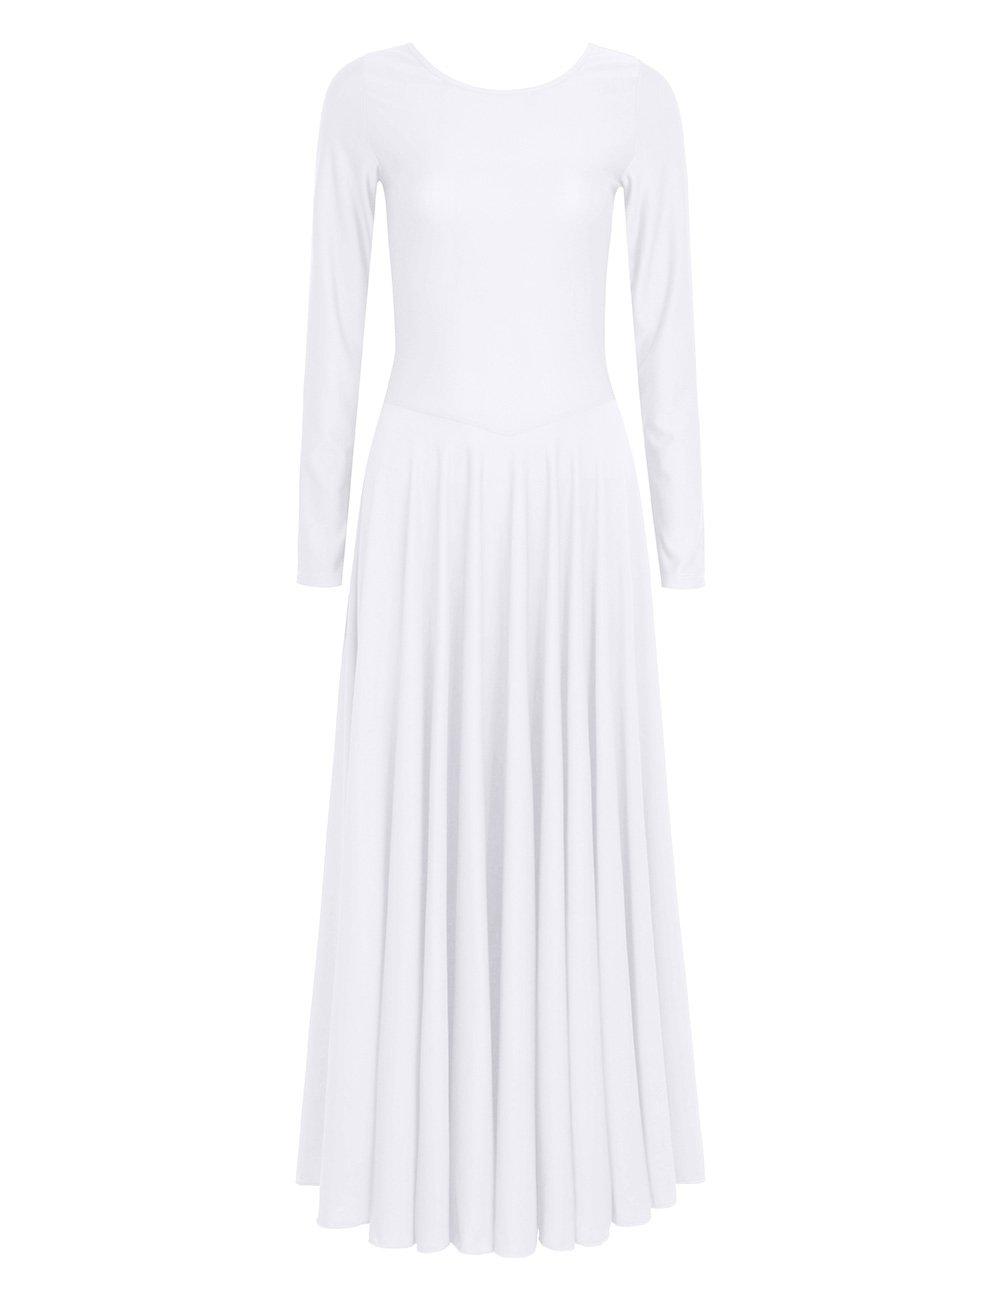 iiniim Womens Liturgical Praise Loose Fit Full Length Long Sleeve Dance Dress White Small